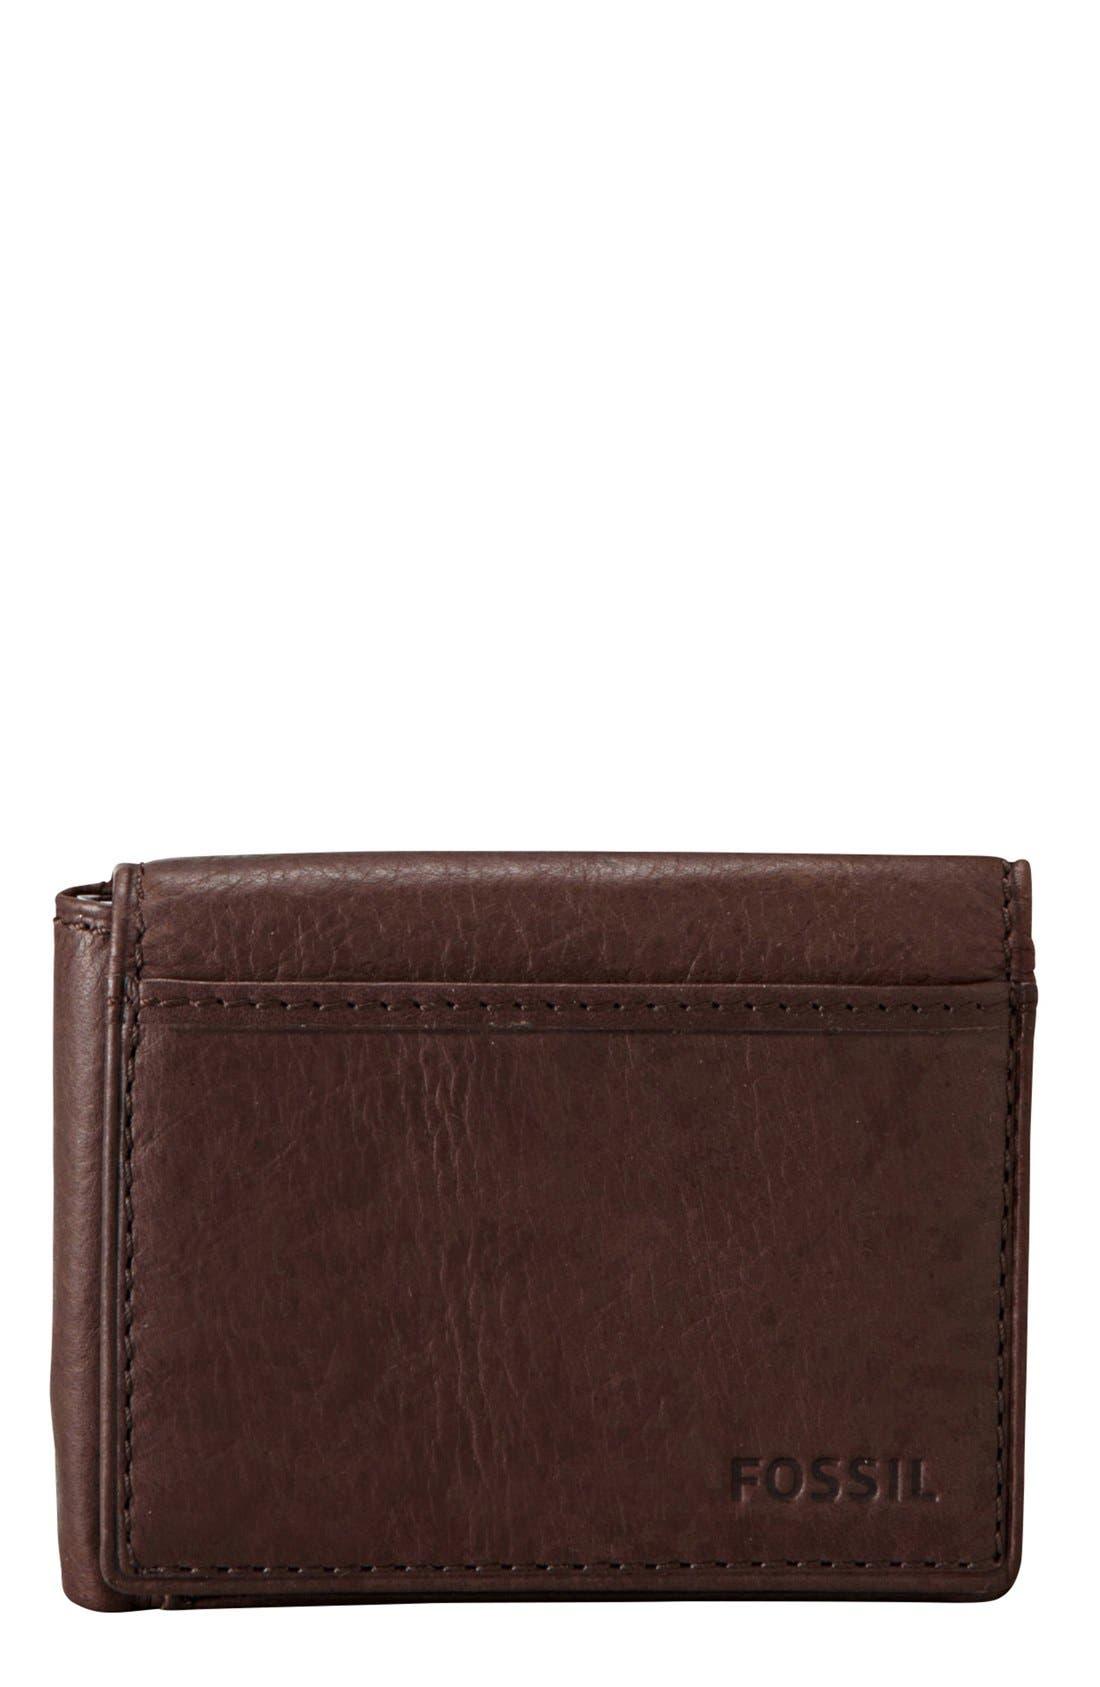 Main Image - Fossil 'Ingram' Leather Flip Trifold Wallet